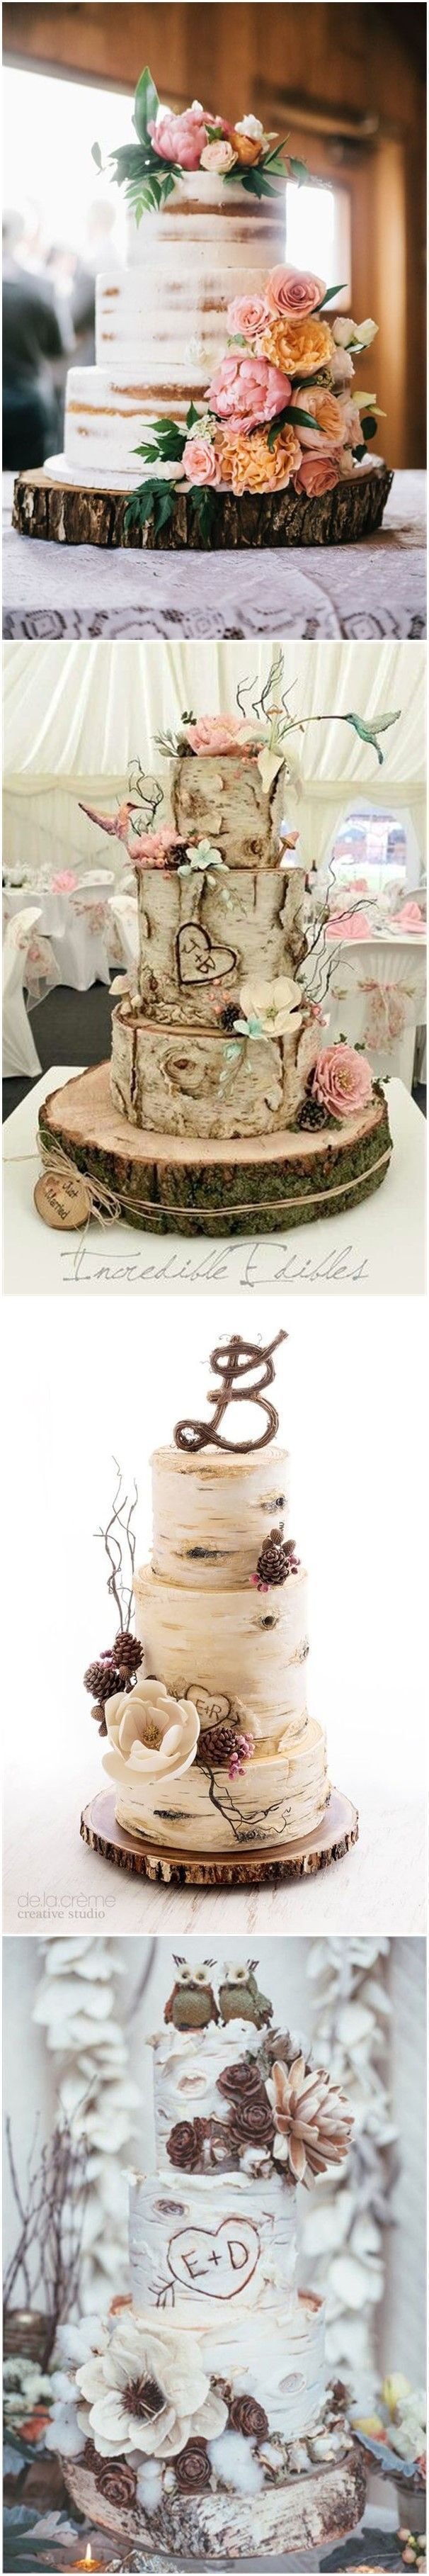 best Pri images on Pinterest Wedding ideas Wedding parties